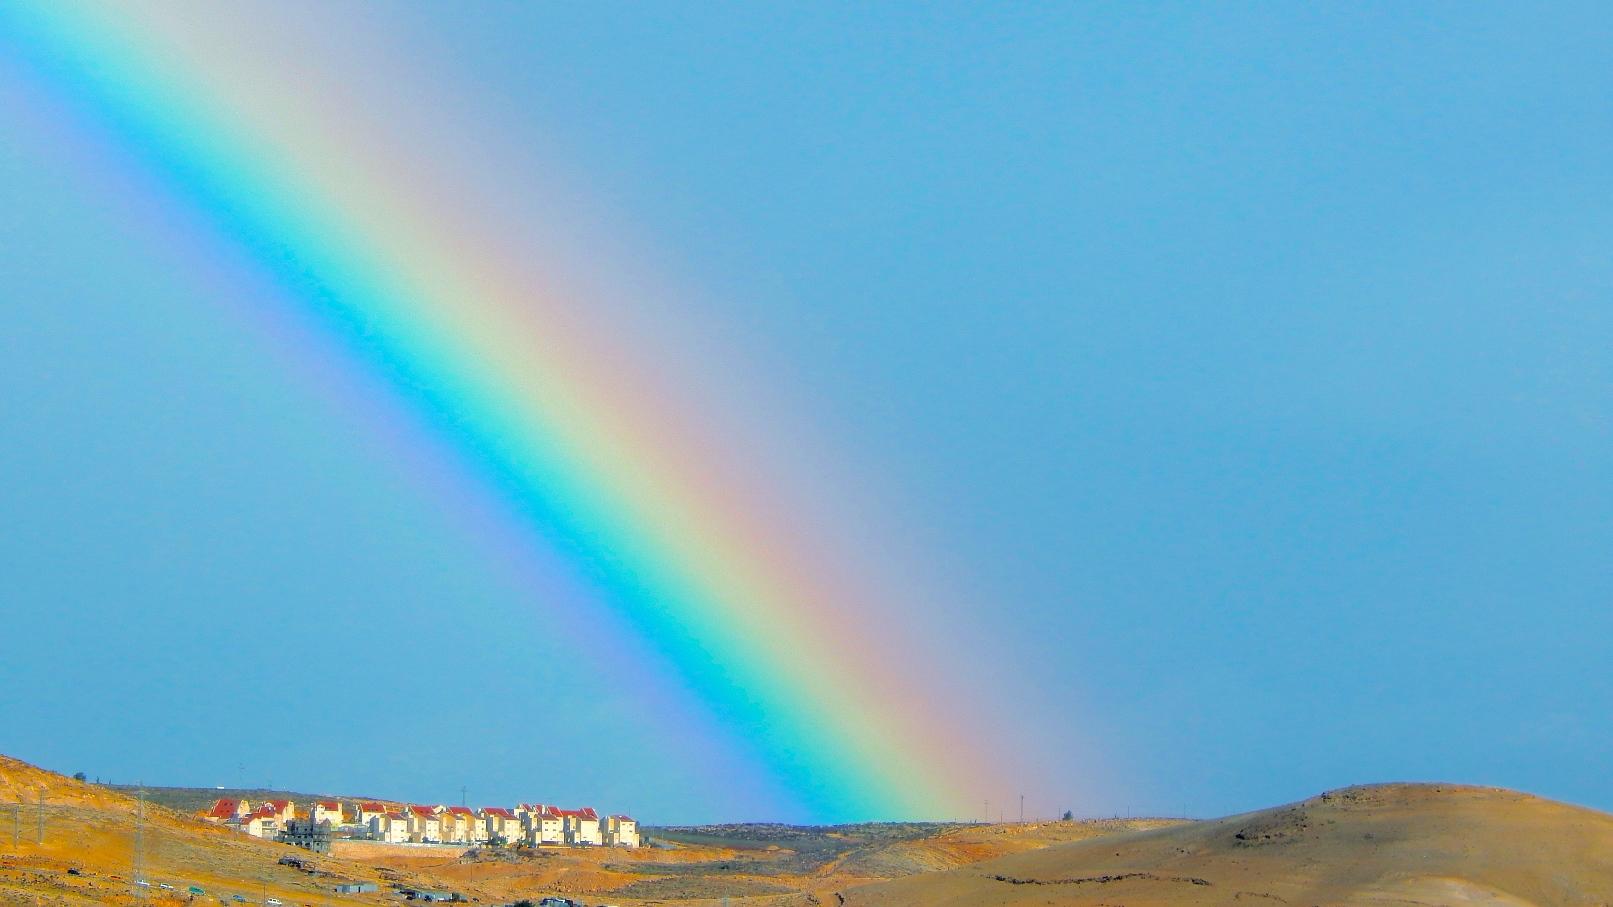 A rainbow arches over Kfar Adumim in the Judean Desert. Photo by Daniel Santacruz